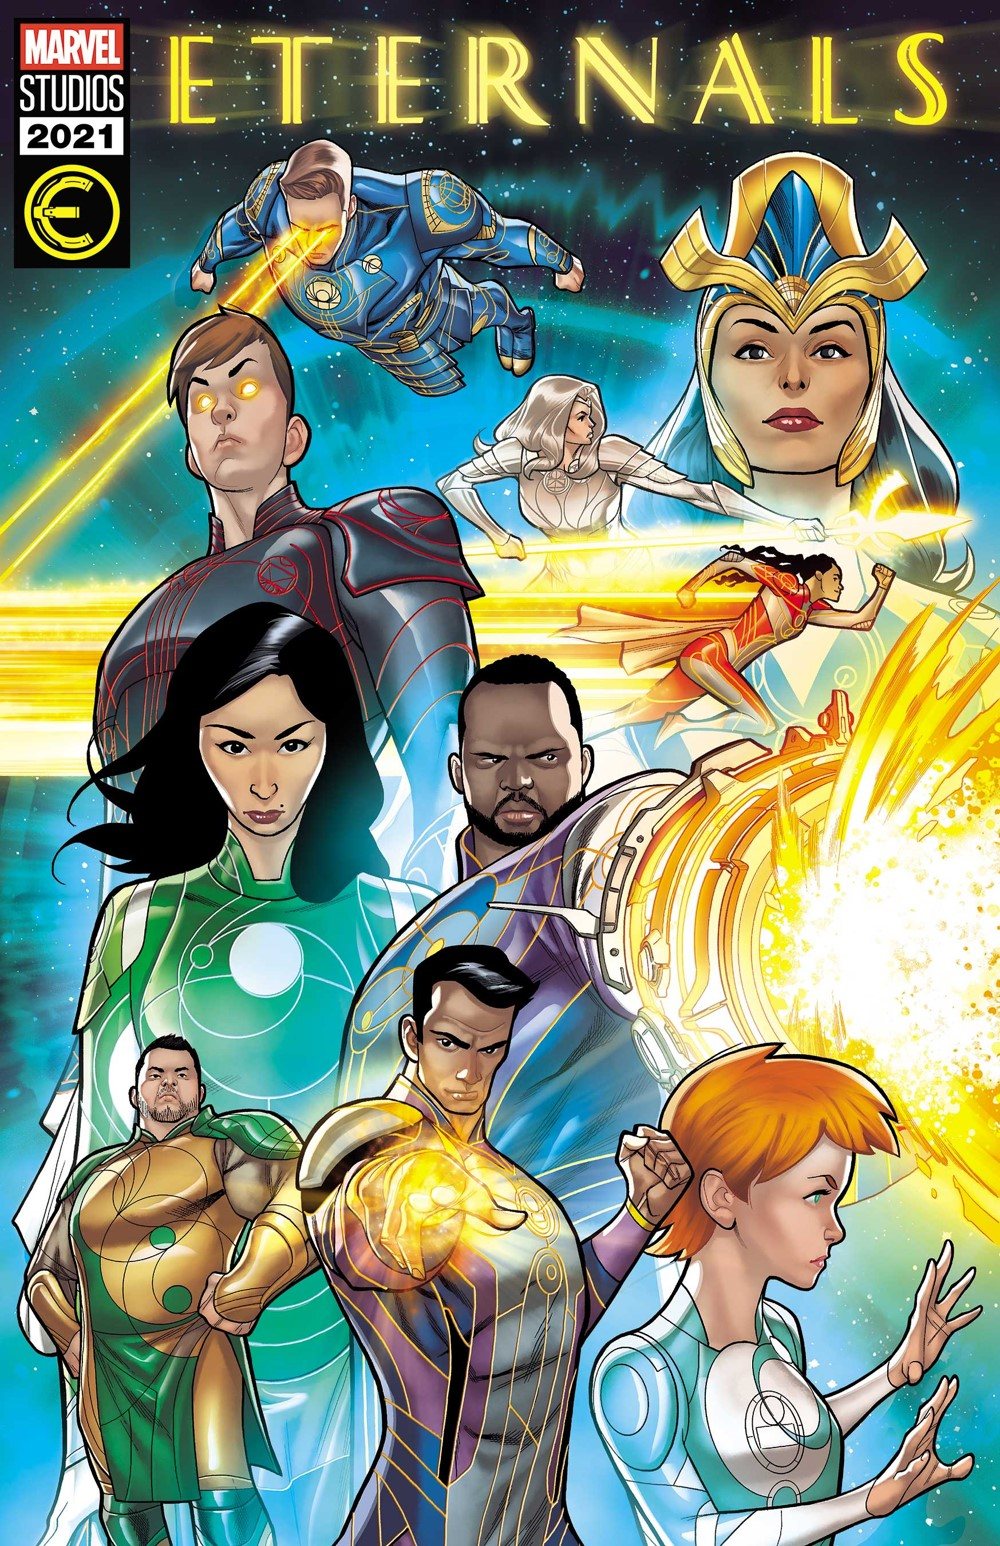 ETRNLS2021007_HENRY_MCU_VAR Marvel Comics November 2021 Solicitations